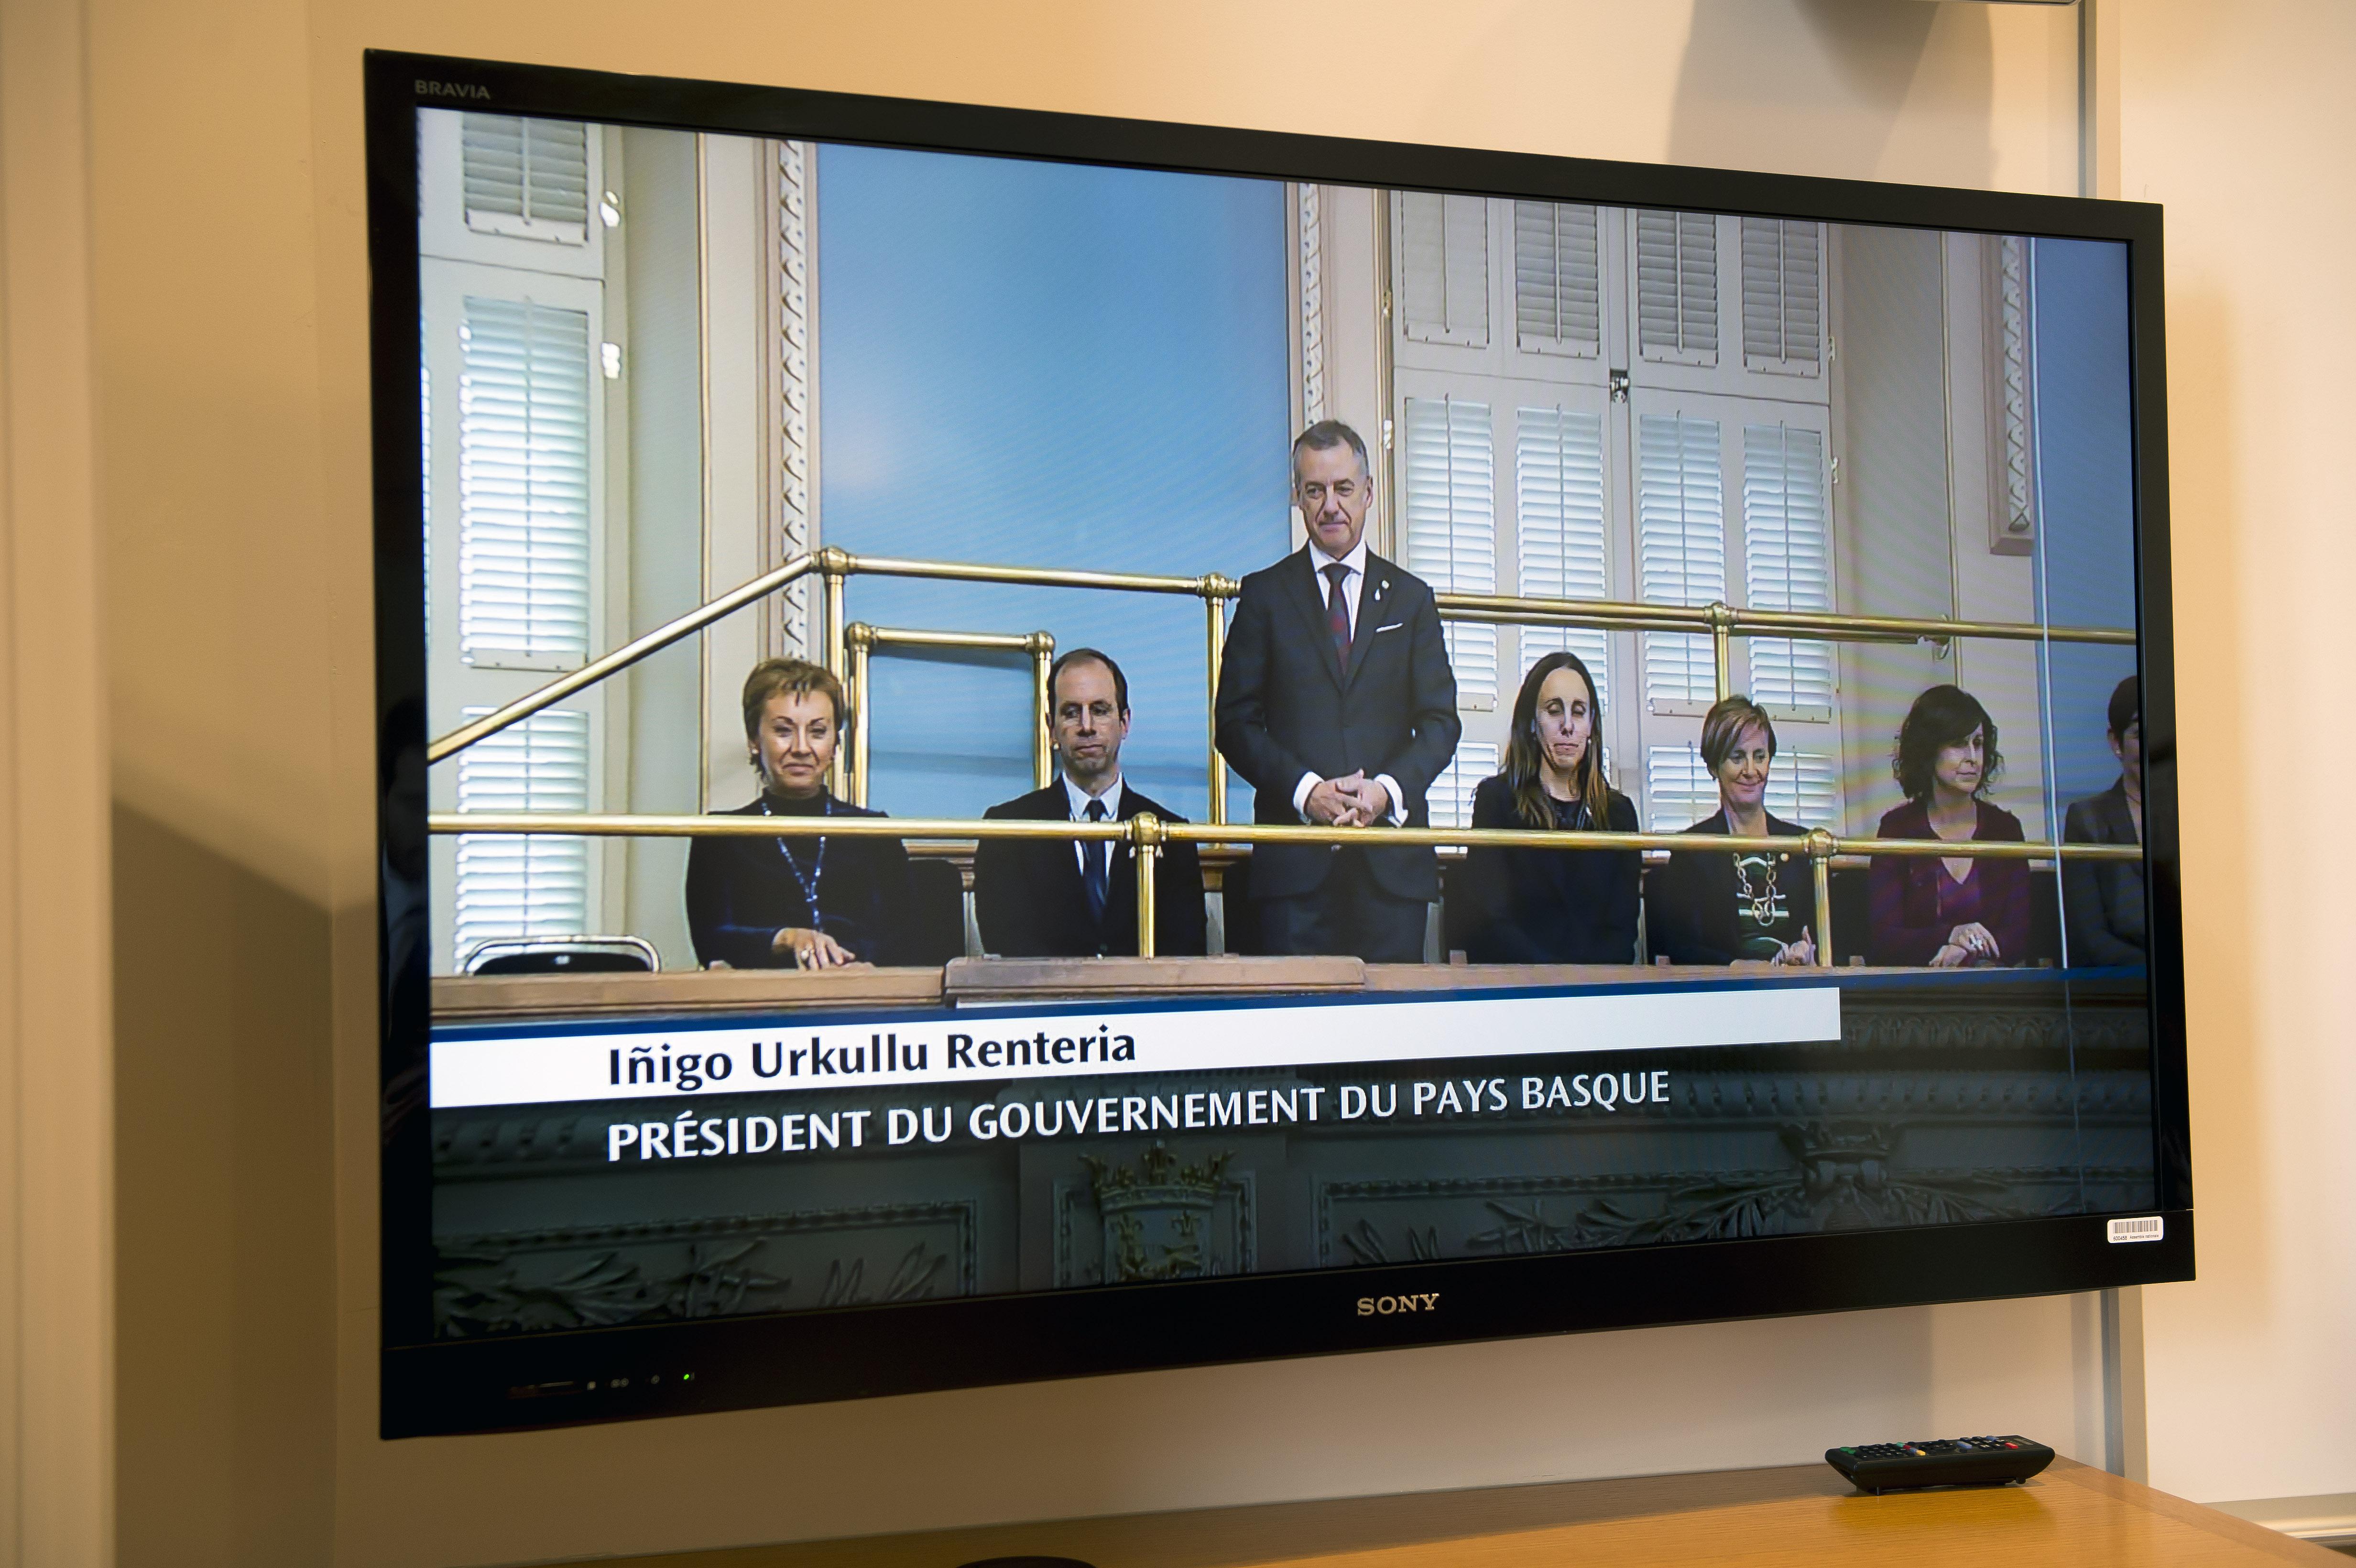 2017_10_31_lhk_parlamento.jpg